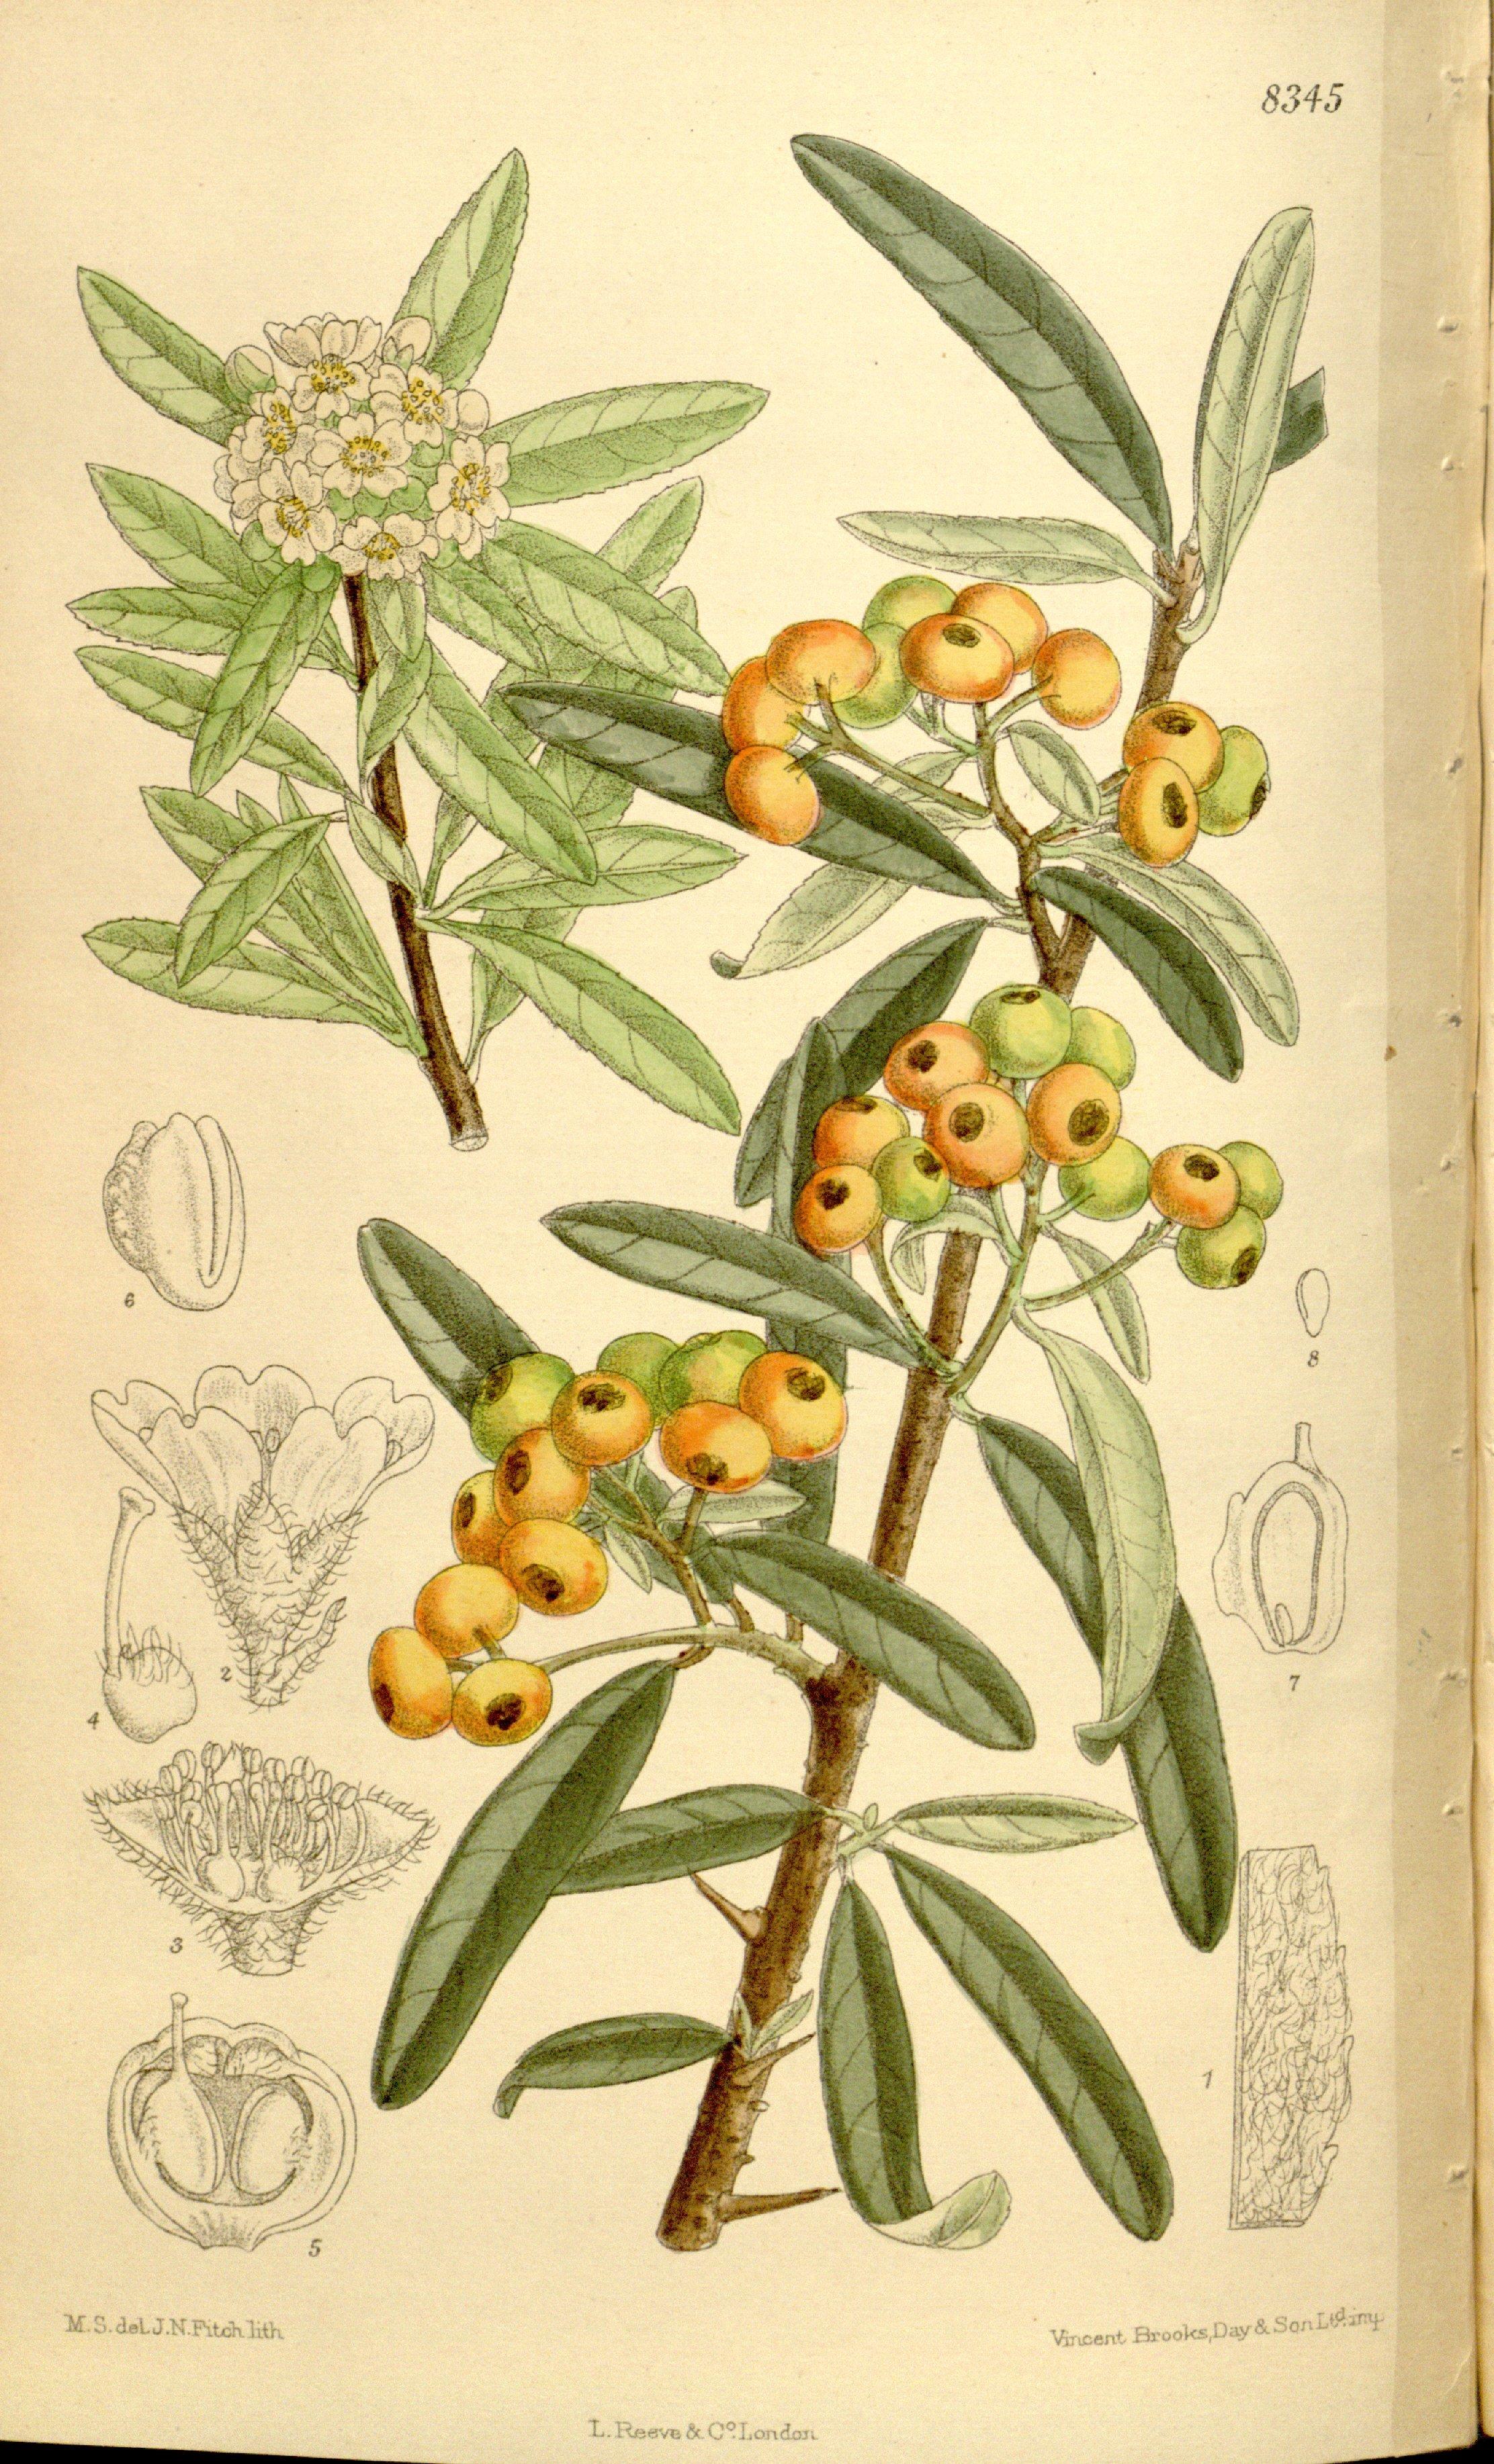 Image of narrowleaf firethorn